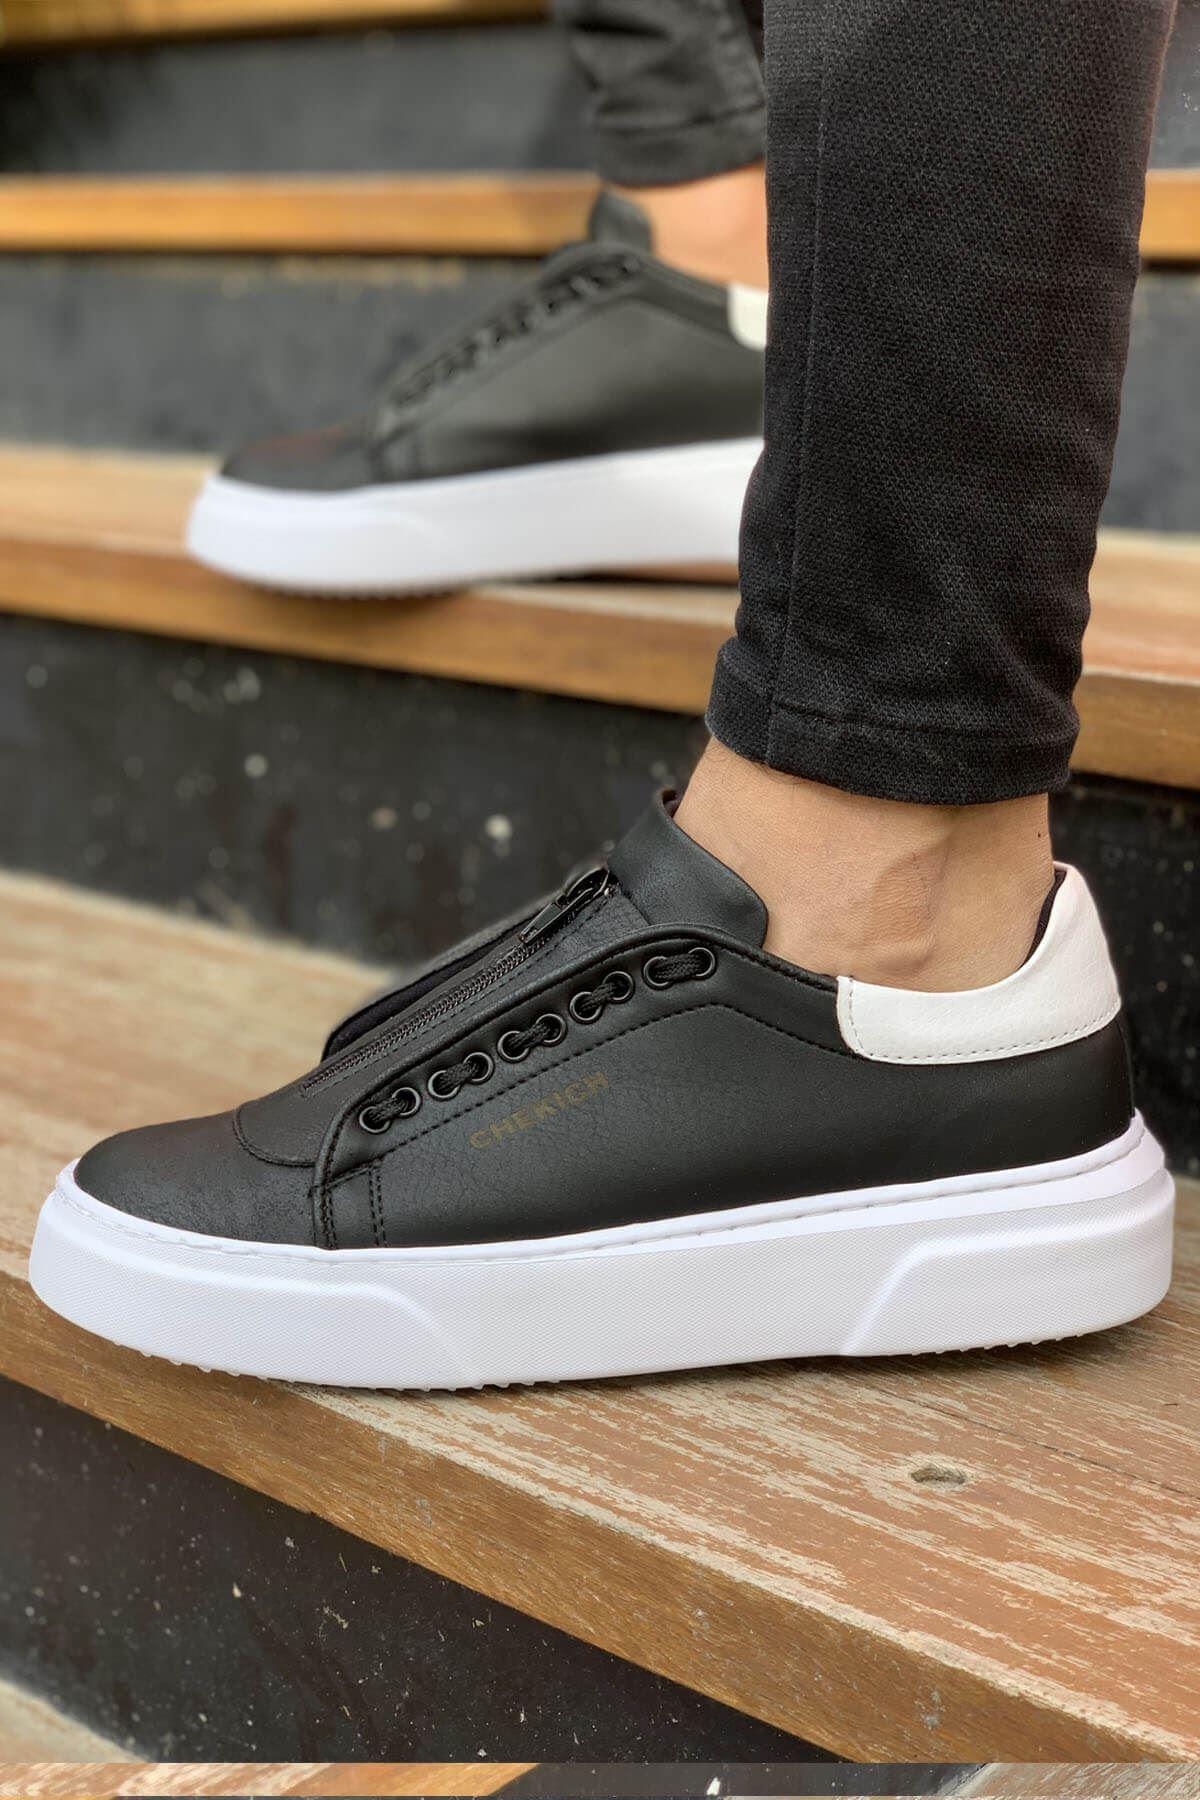 Chekich CH092 GBT Erkek Ayakkabı SİYAH / BEYAZ